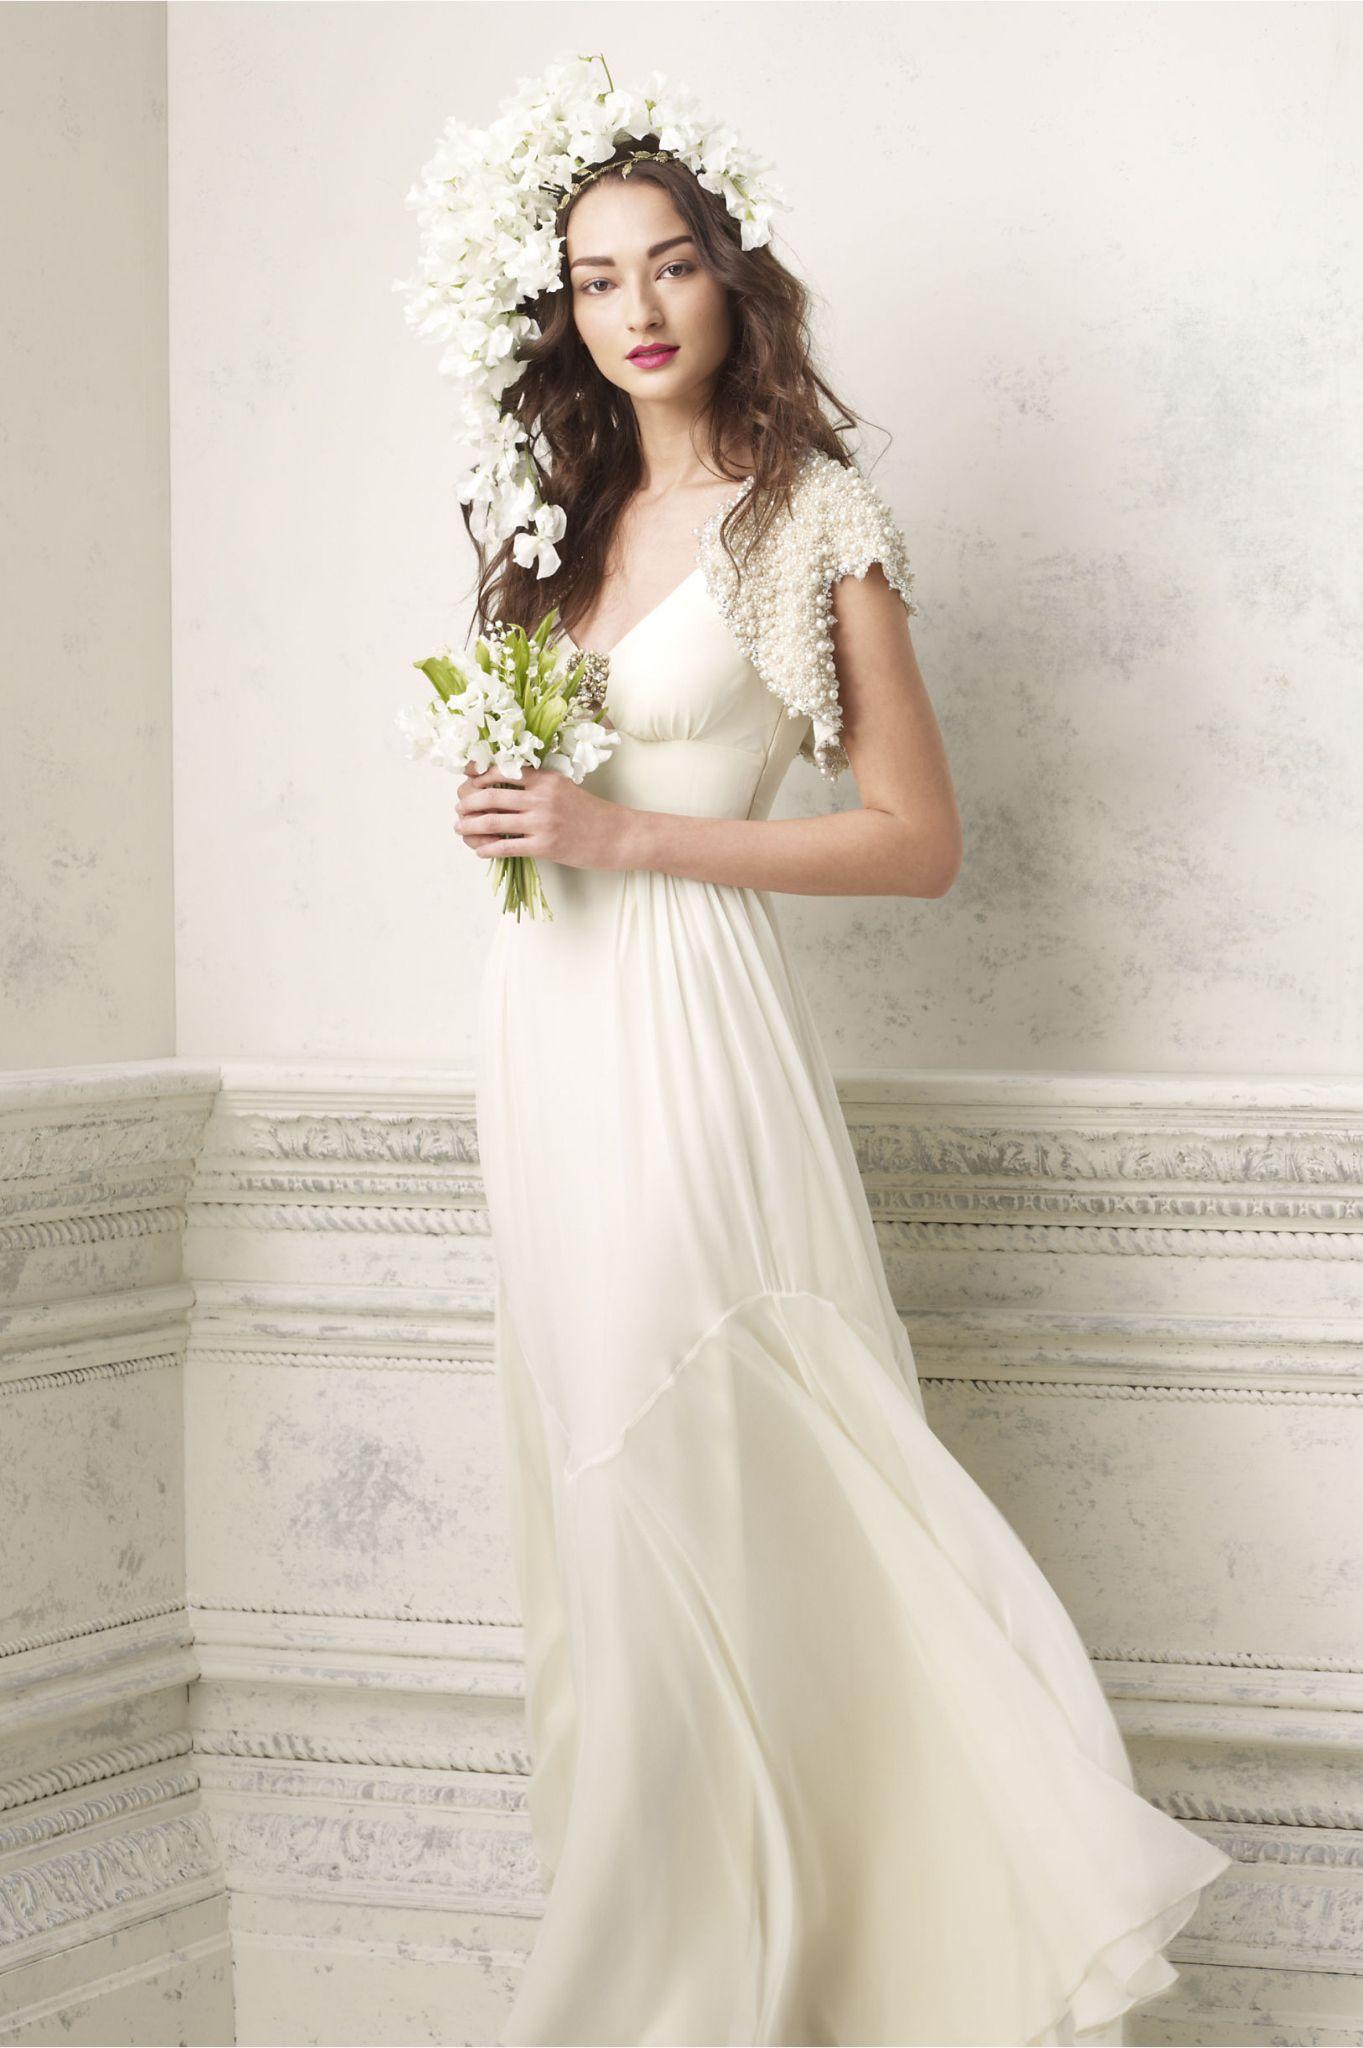 Simple Off White Wedding Dress - Informal Wedding Dresses for Older ...